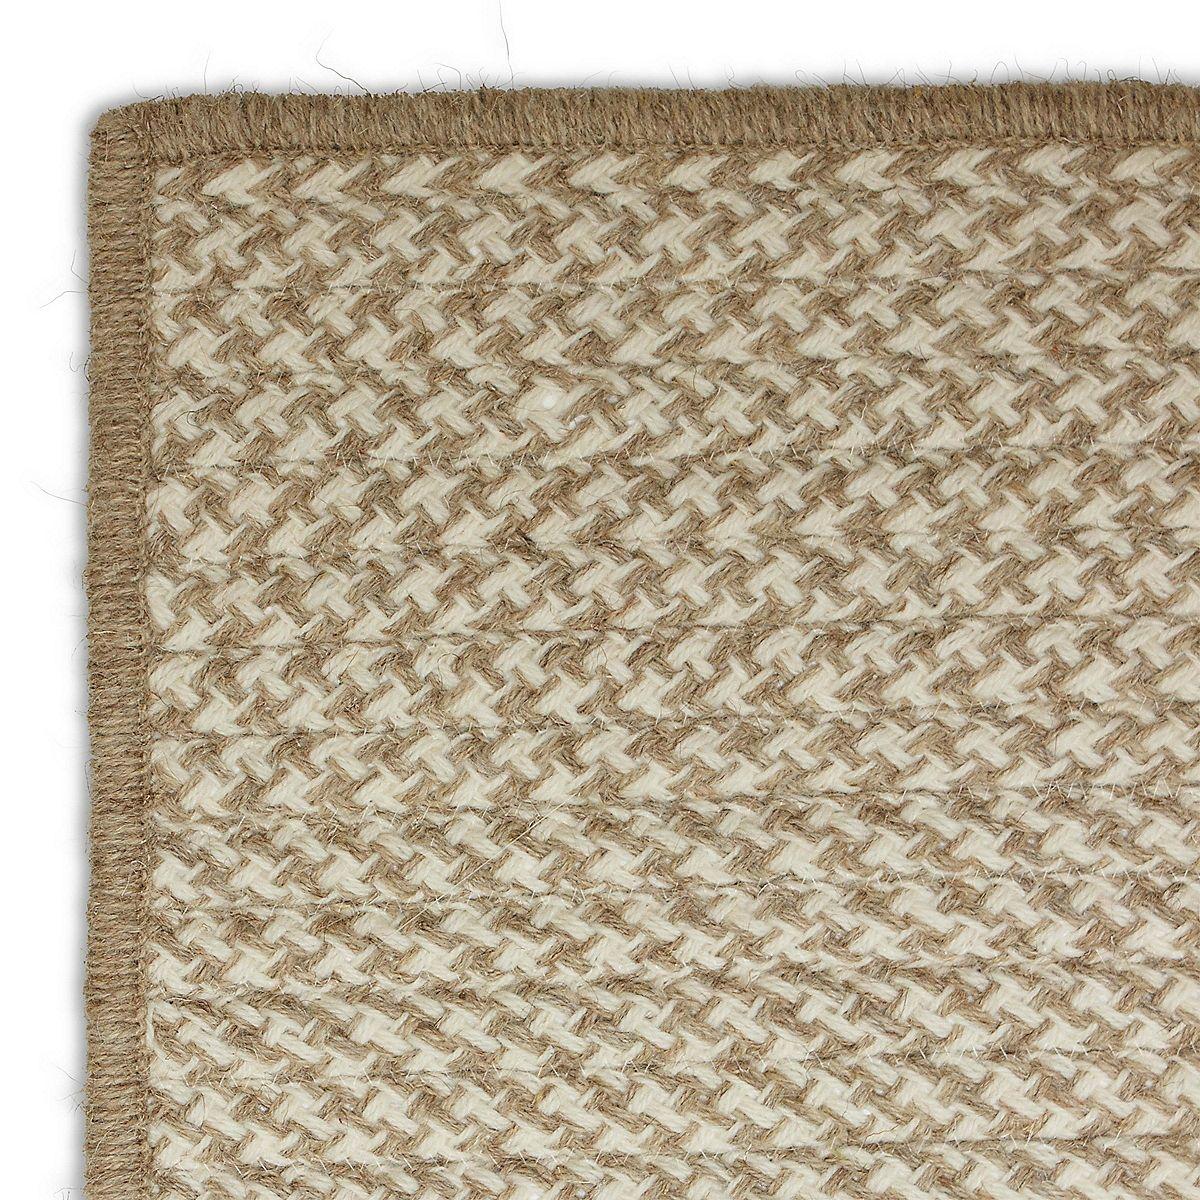 Houndstooth Wool Rug Ivory Maine Cottagehoundstoothwool